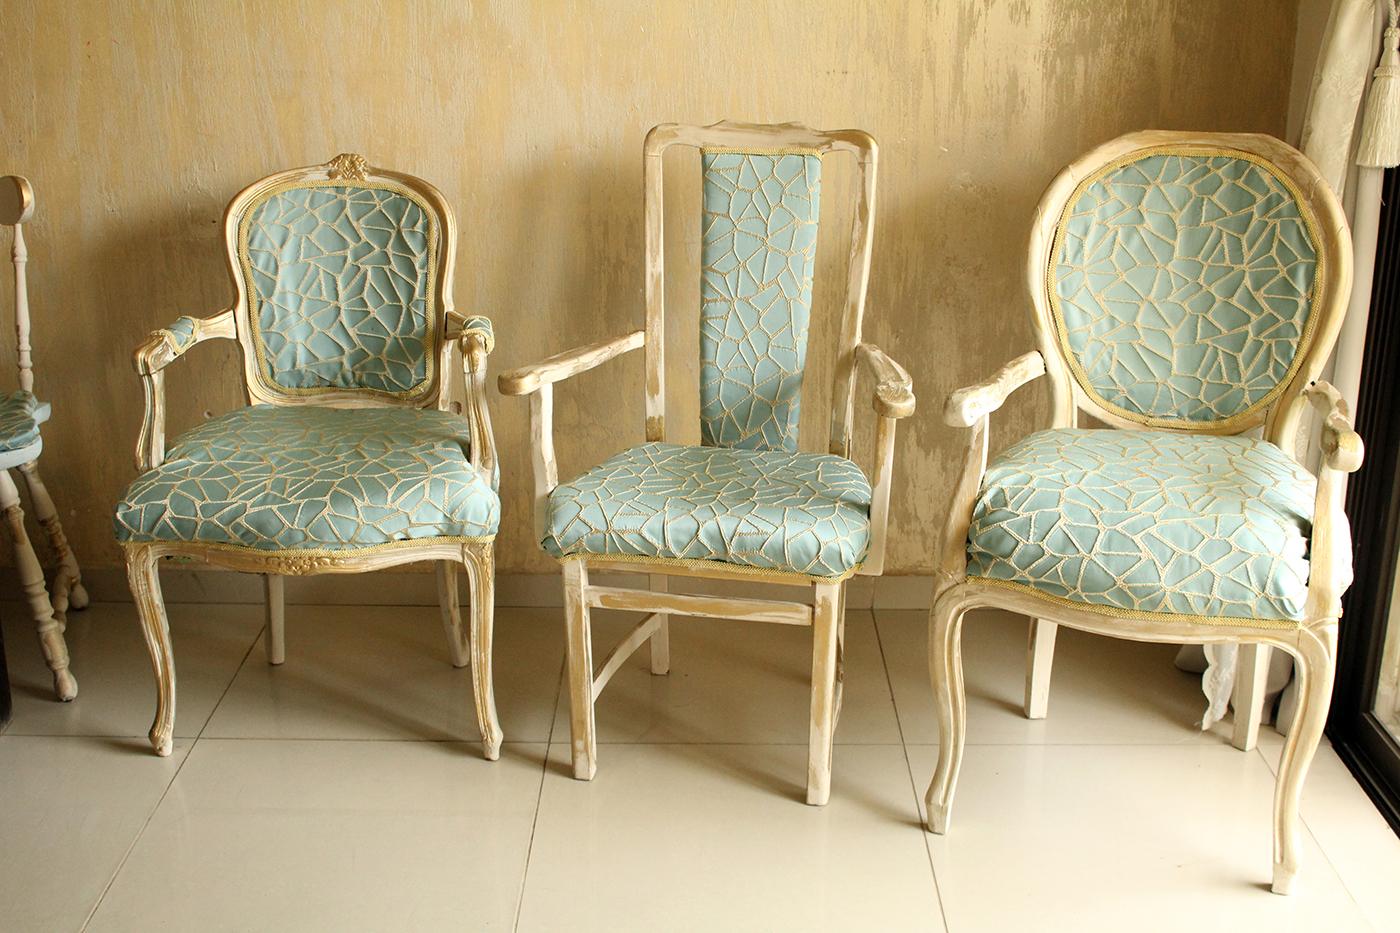 IMG 7966 - חידוש כסא לסט הסלוני